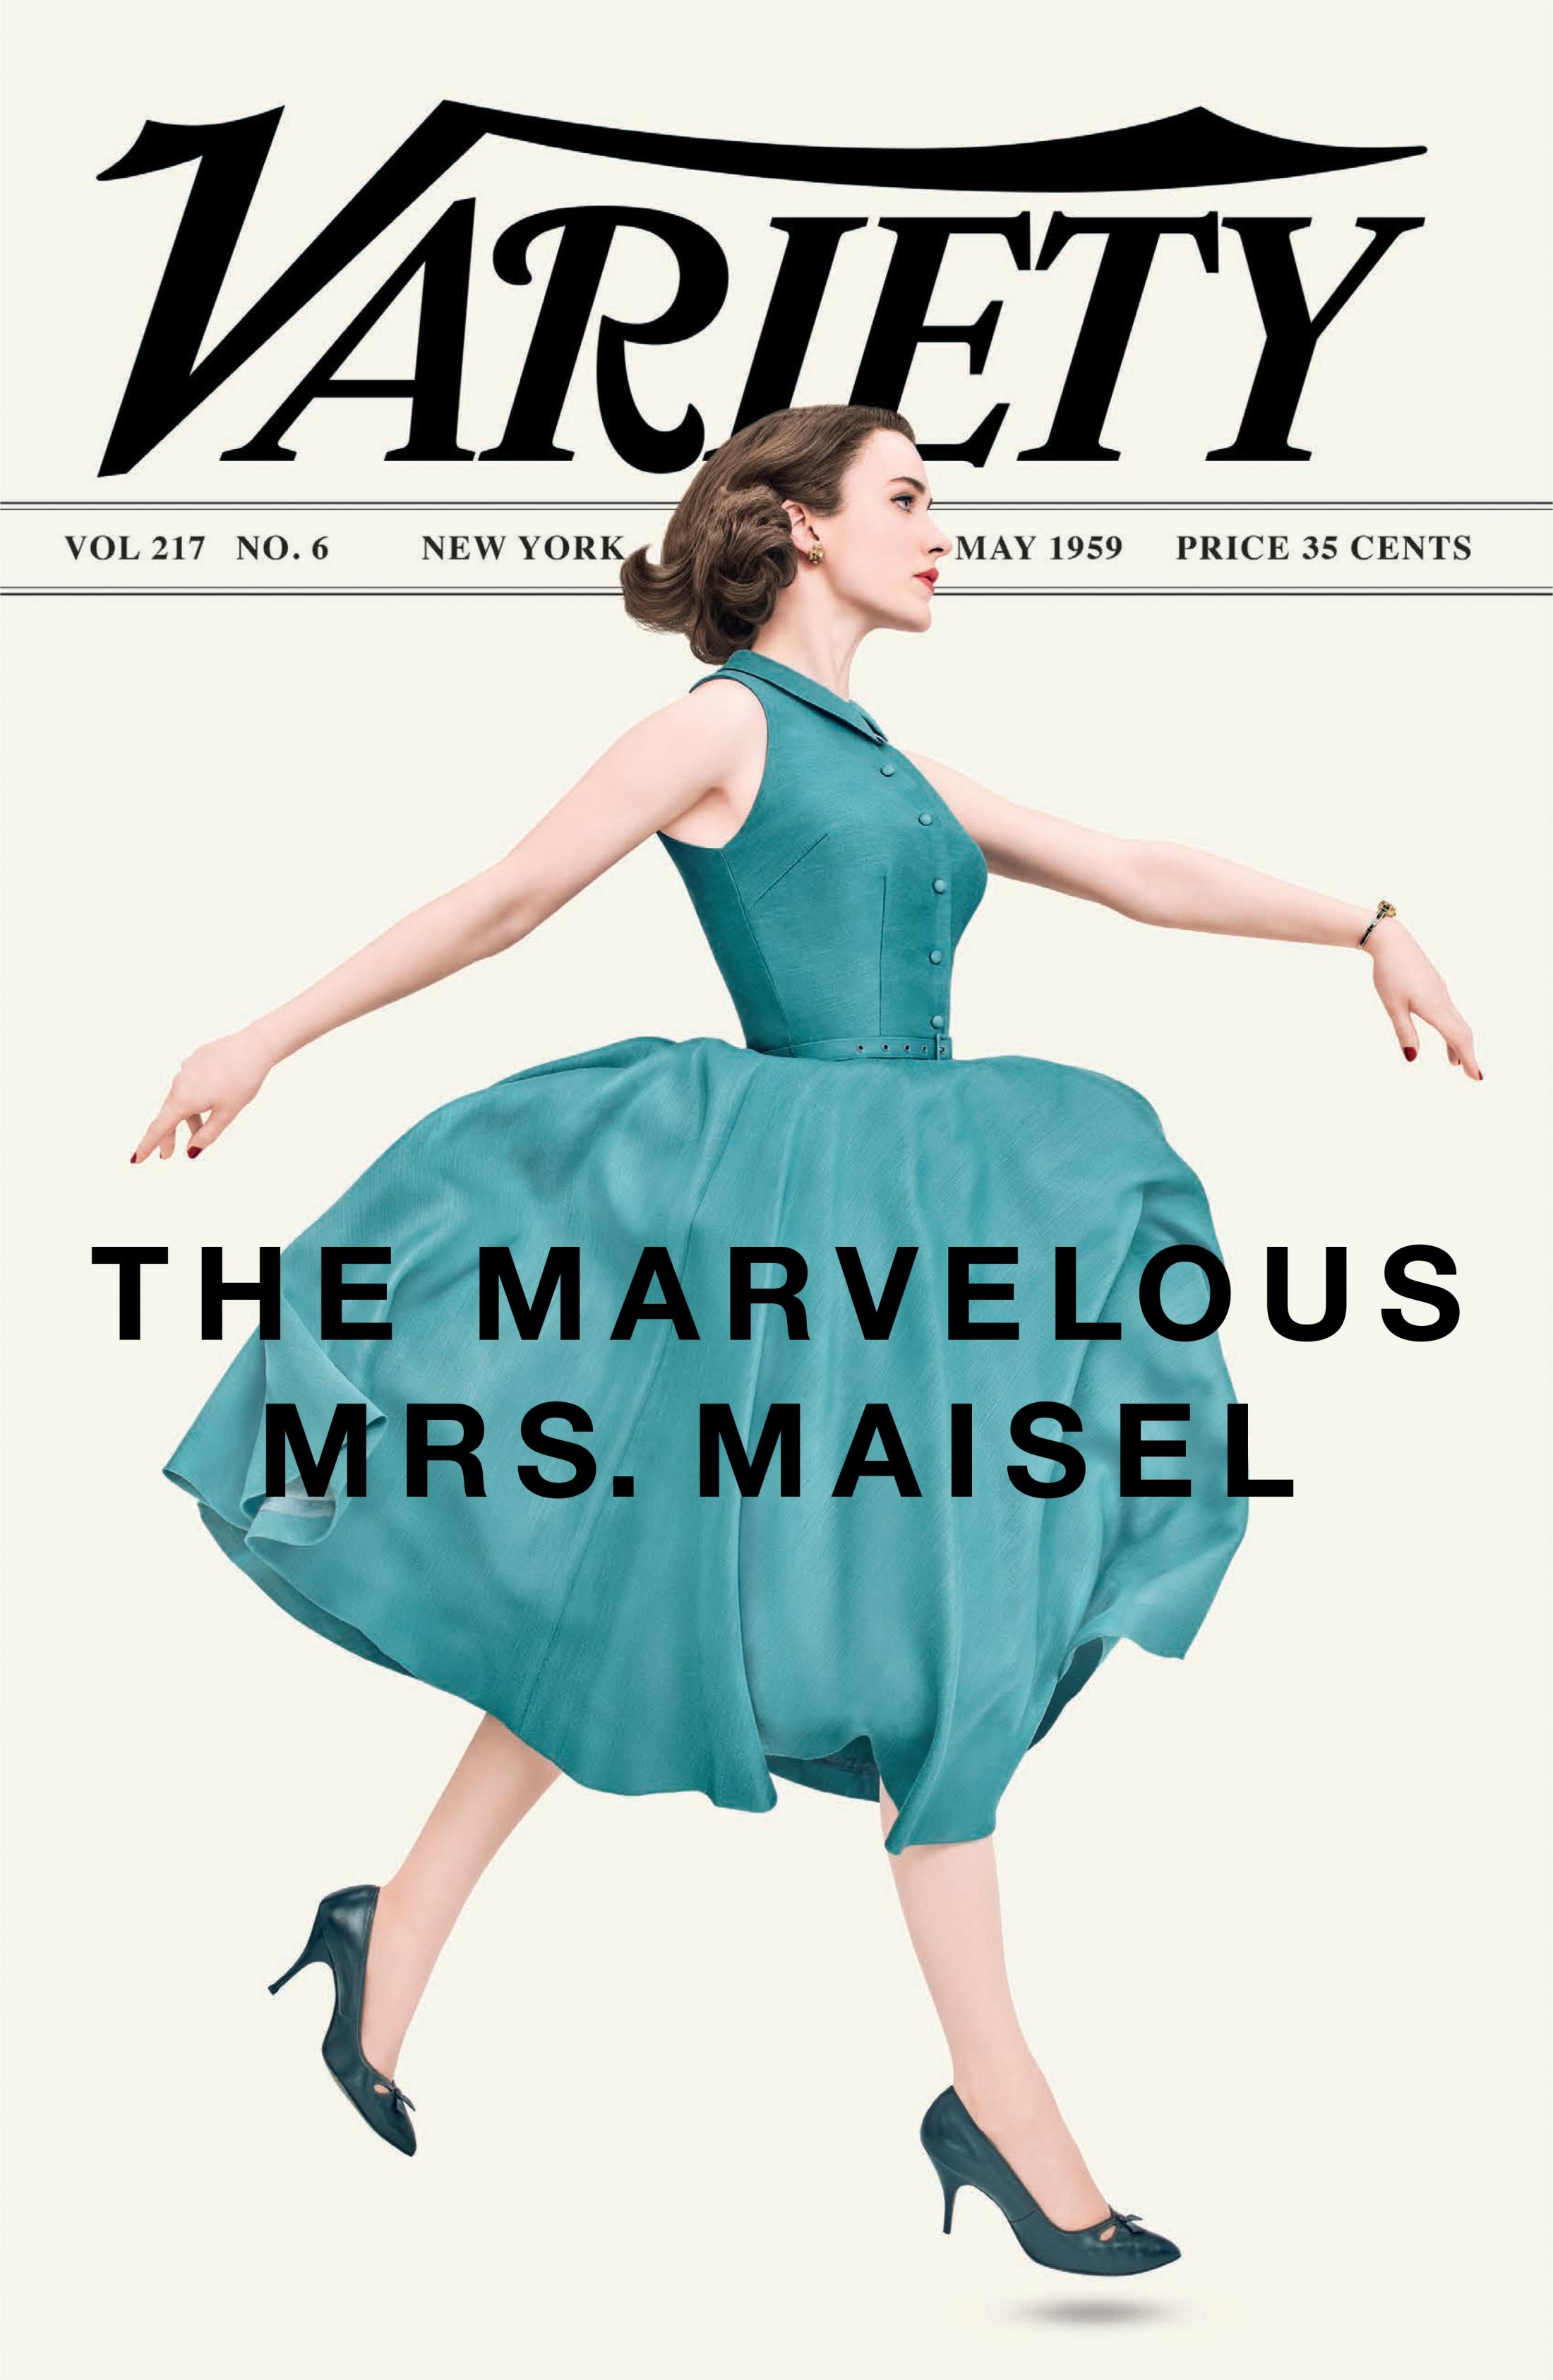 Thumbnail for The Marvelous Mrs. Maisel Magazine Cover Takeover (Variety)